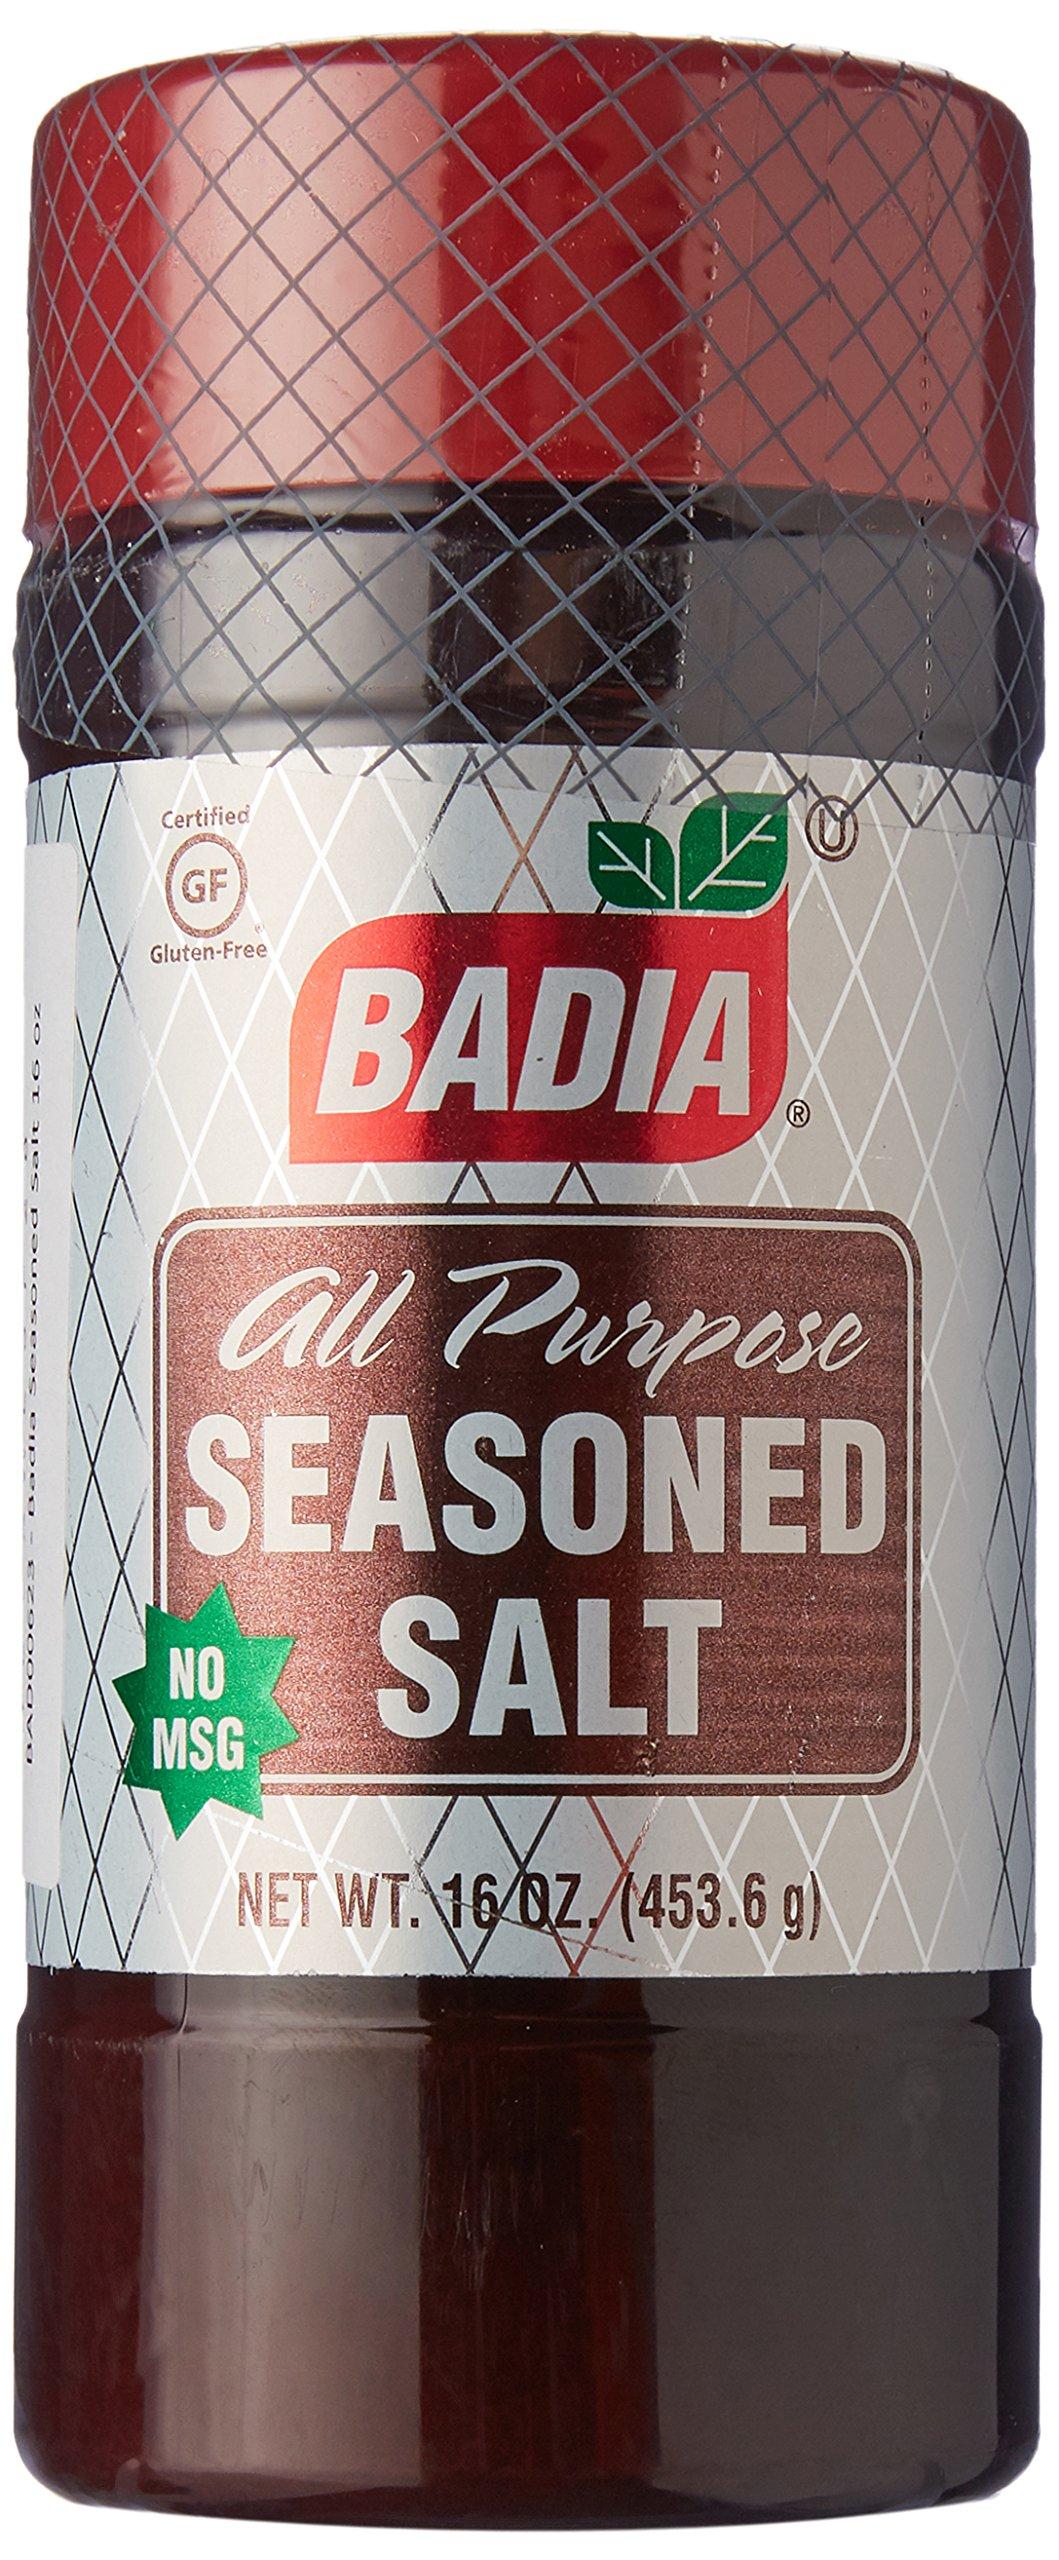 BADIA SEASON SALT, 16 OZ